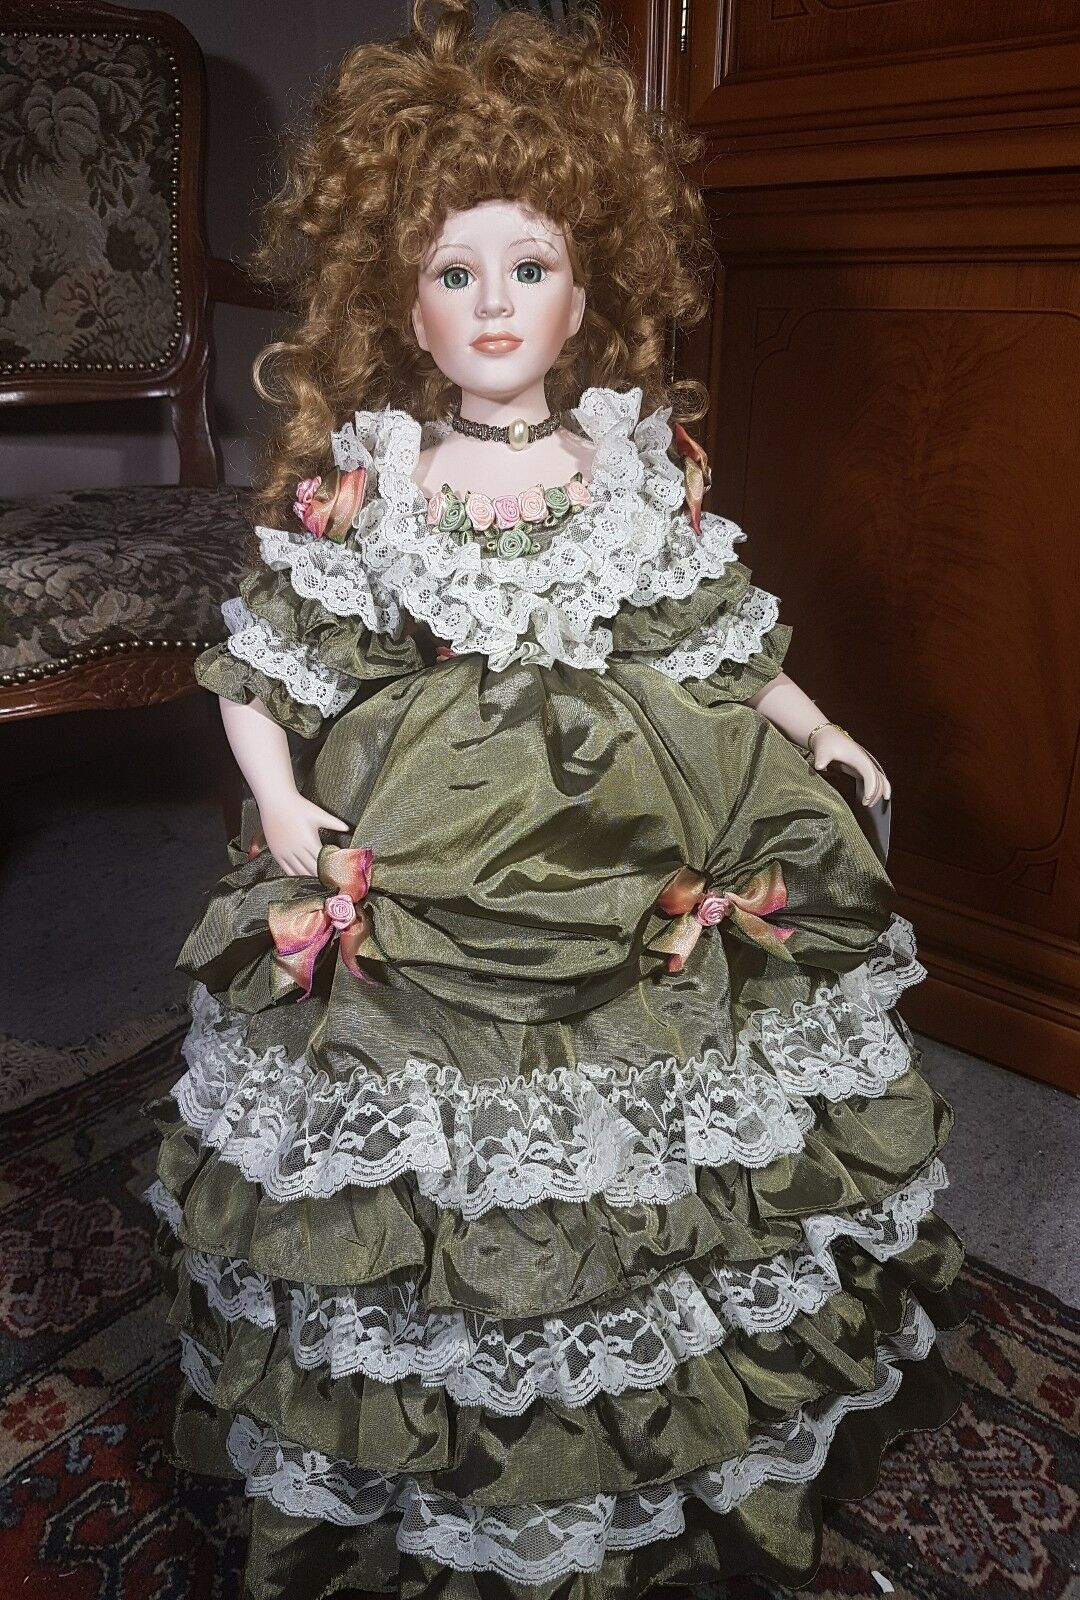 Künstlerpuppen Porzellanpuppe Porzellanpuppe Porzellanpuppe von Court of Dolls ca.70 cm 8d757e